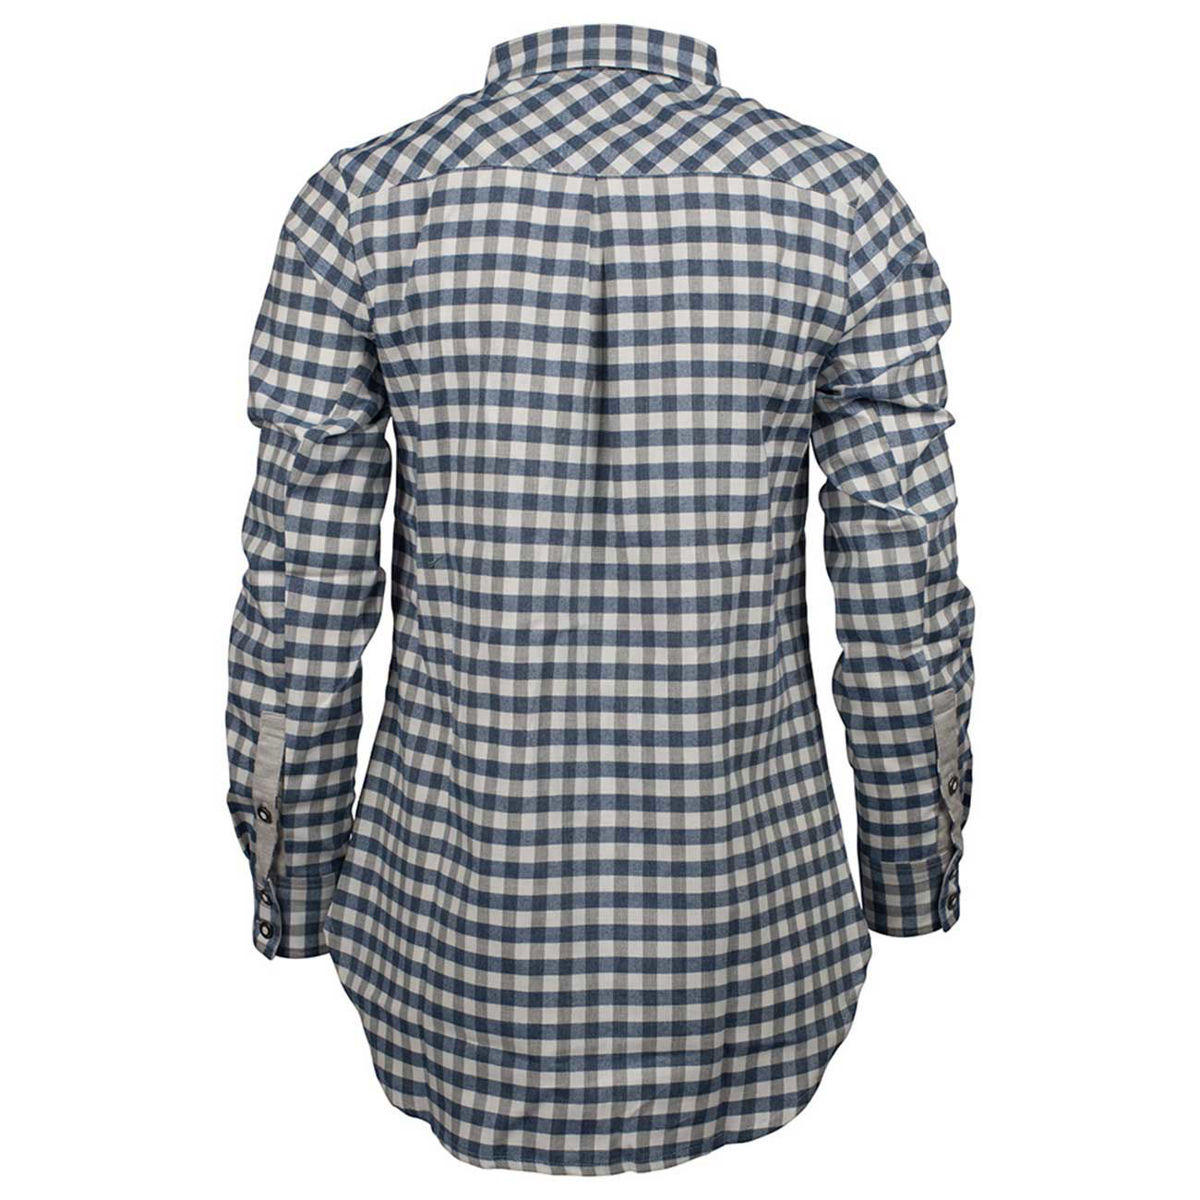 Bilde av Amundsen Vagabond Shirt Womens WSH52.1.540, Small Checkered Blue